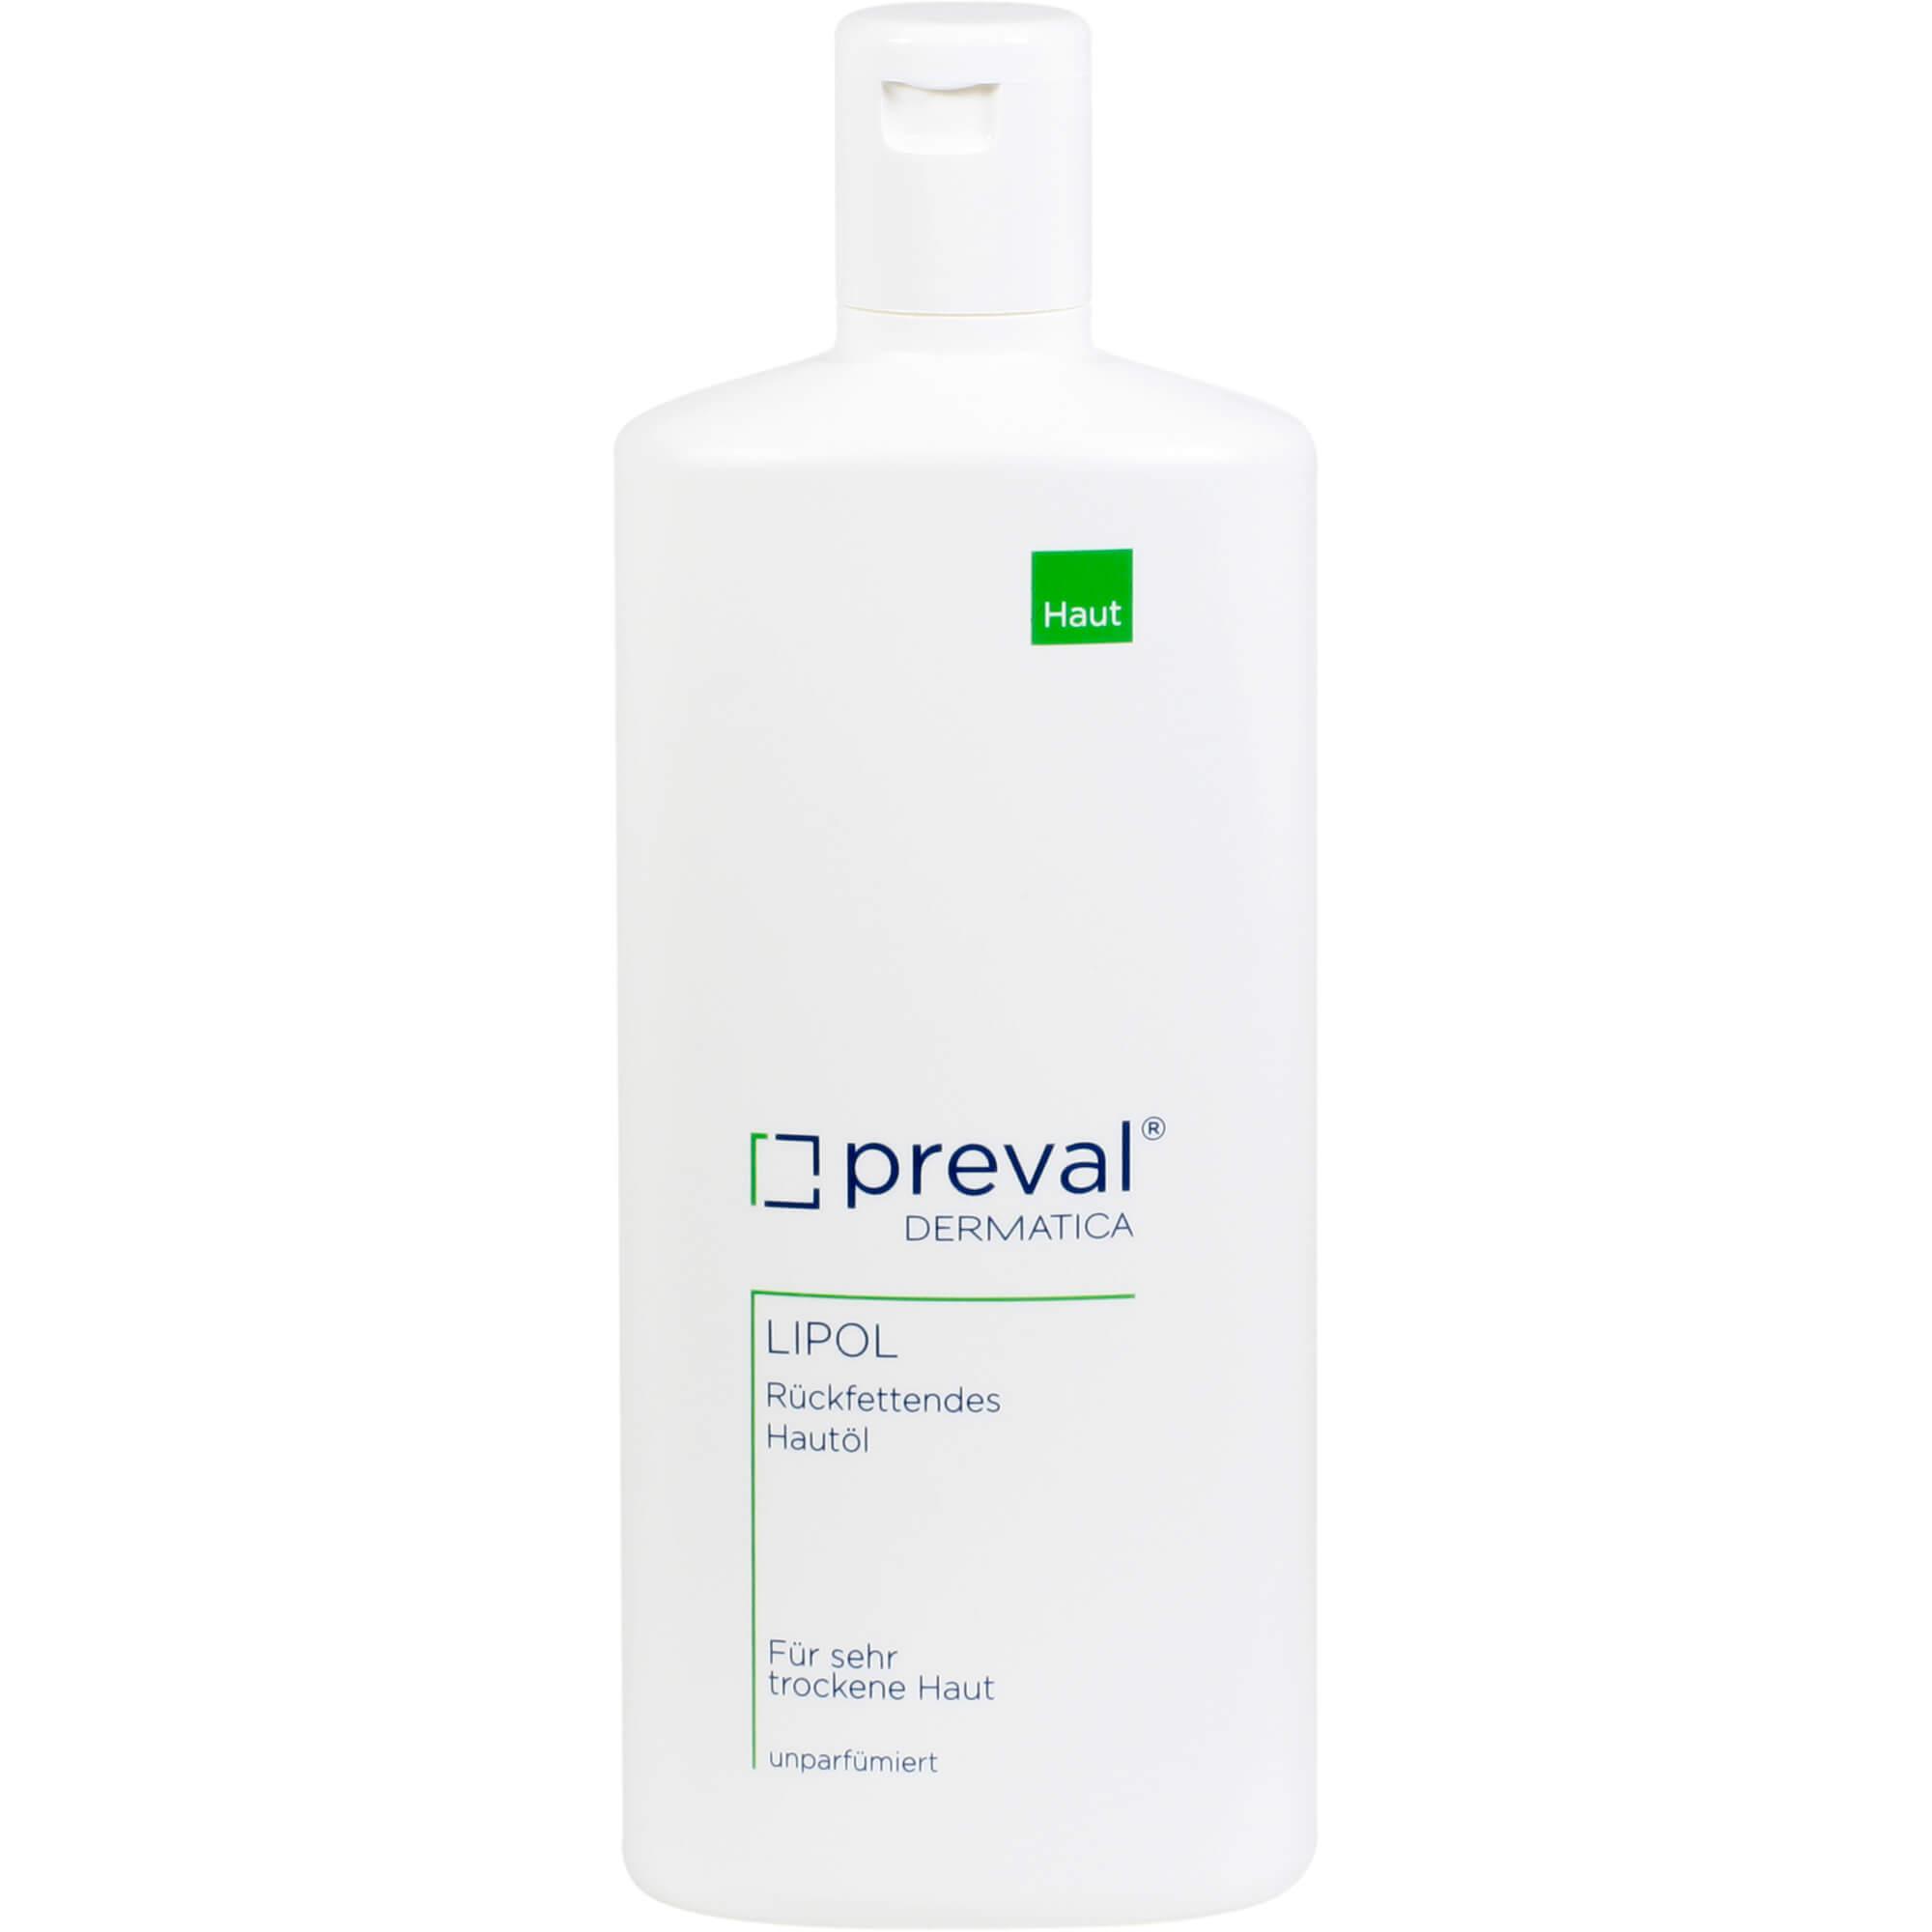 Preval Lipol Hautöl